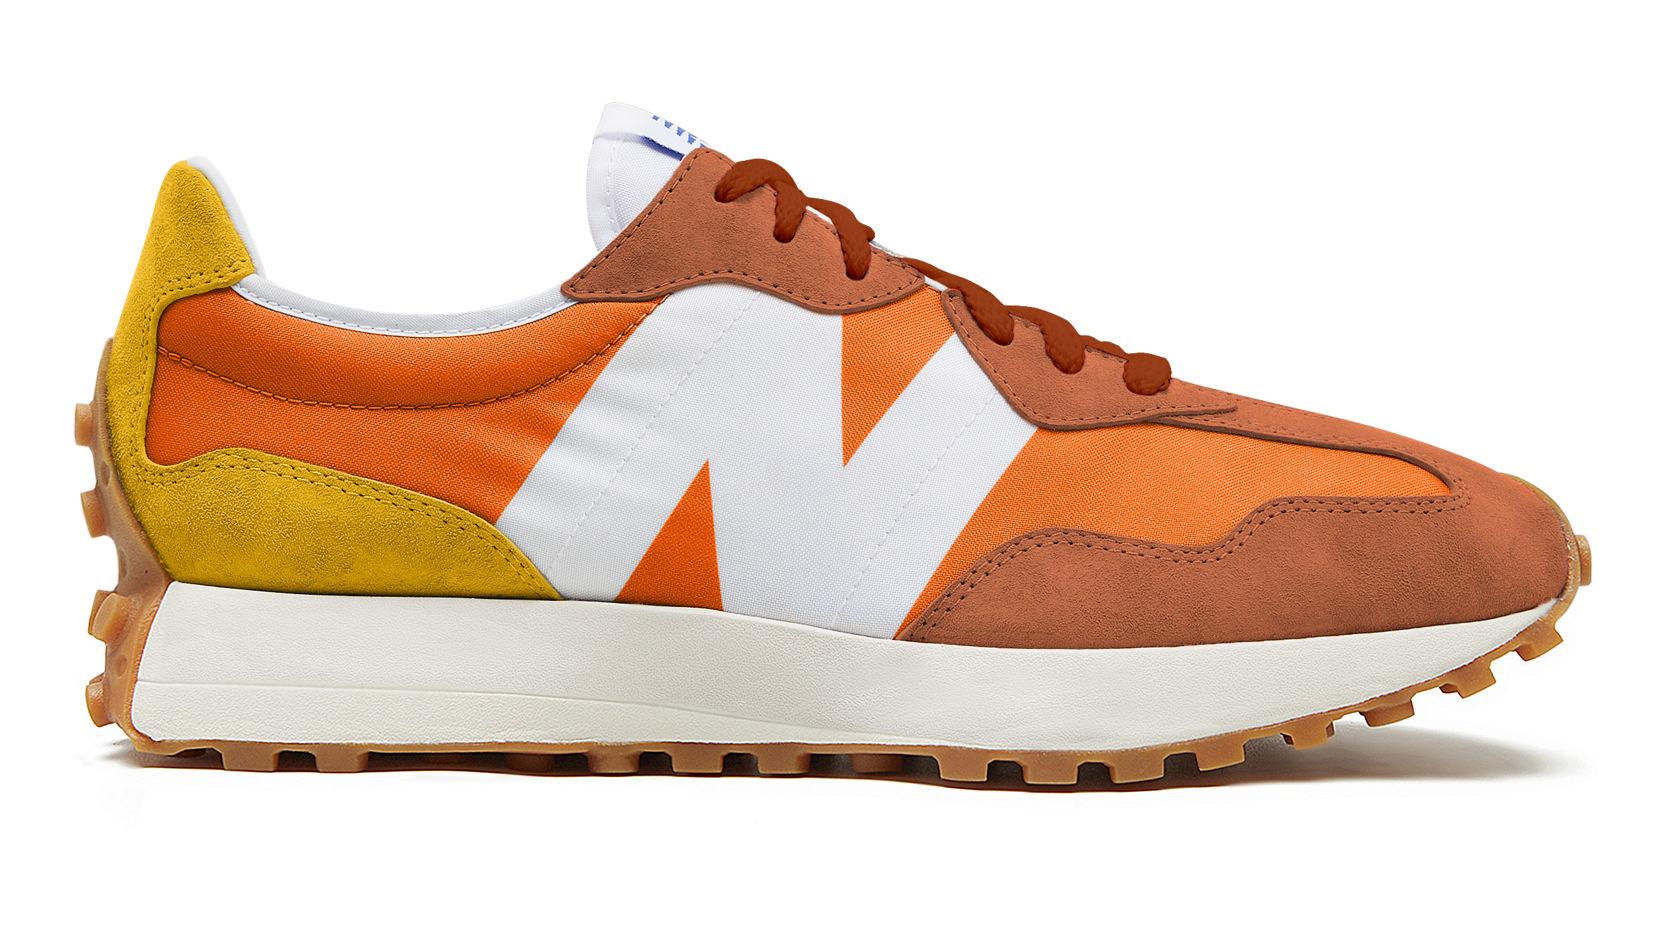 new balance 327, sneakers, week 26